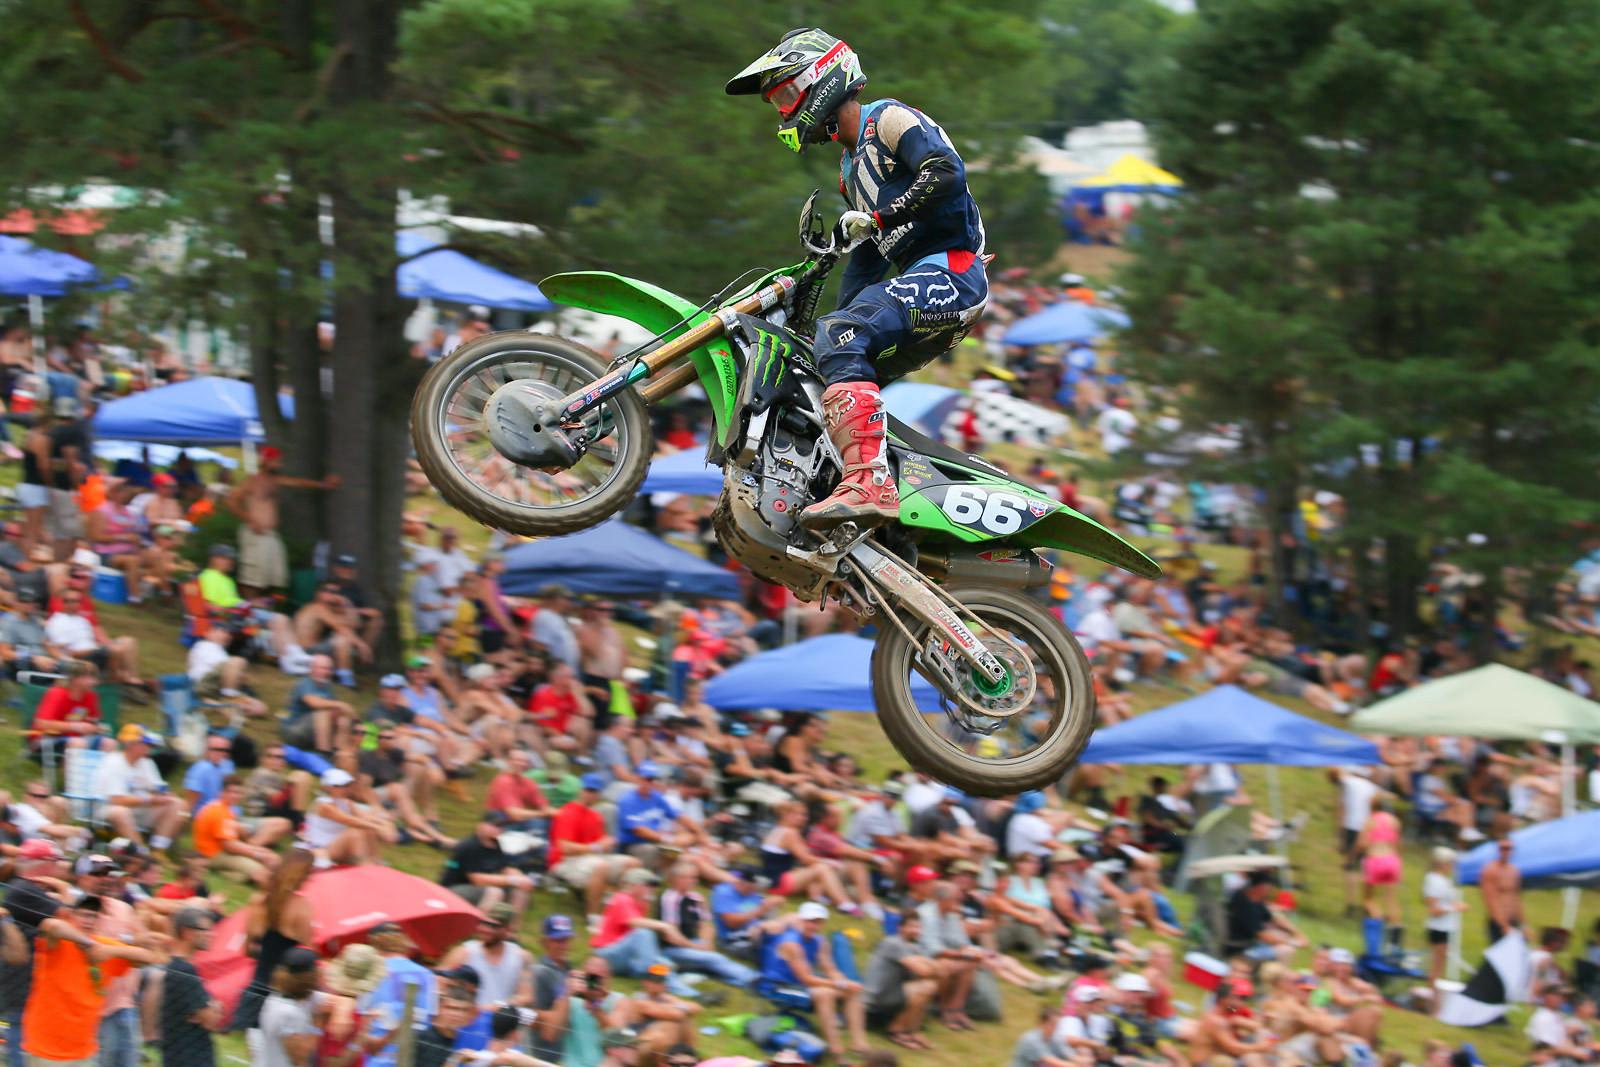 Arnaud Tonus - GuyB - Motocross Pictures - Vital MX